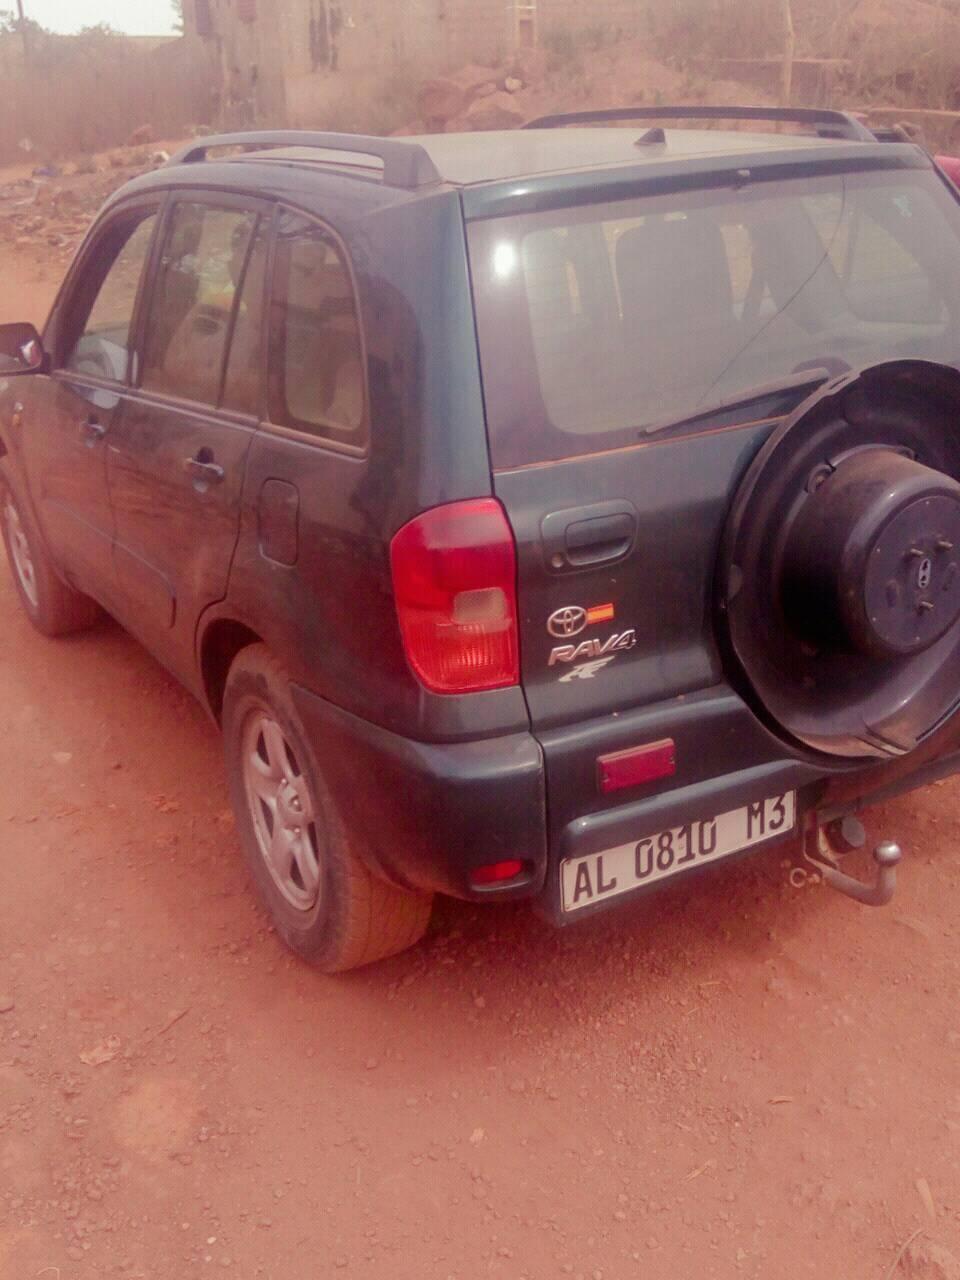 RAV4 à vendre à 2 500 000 FCFA diesel